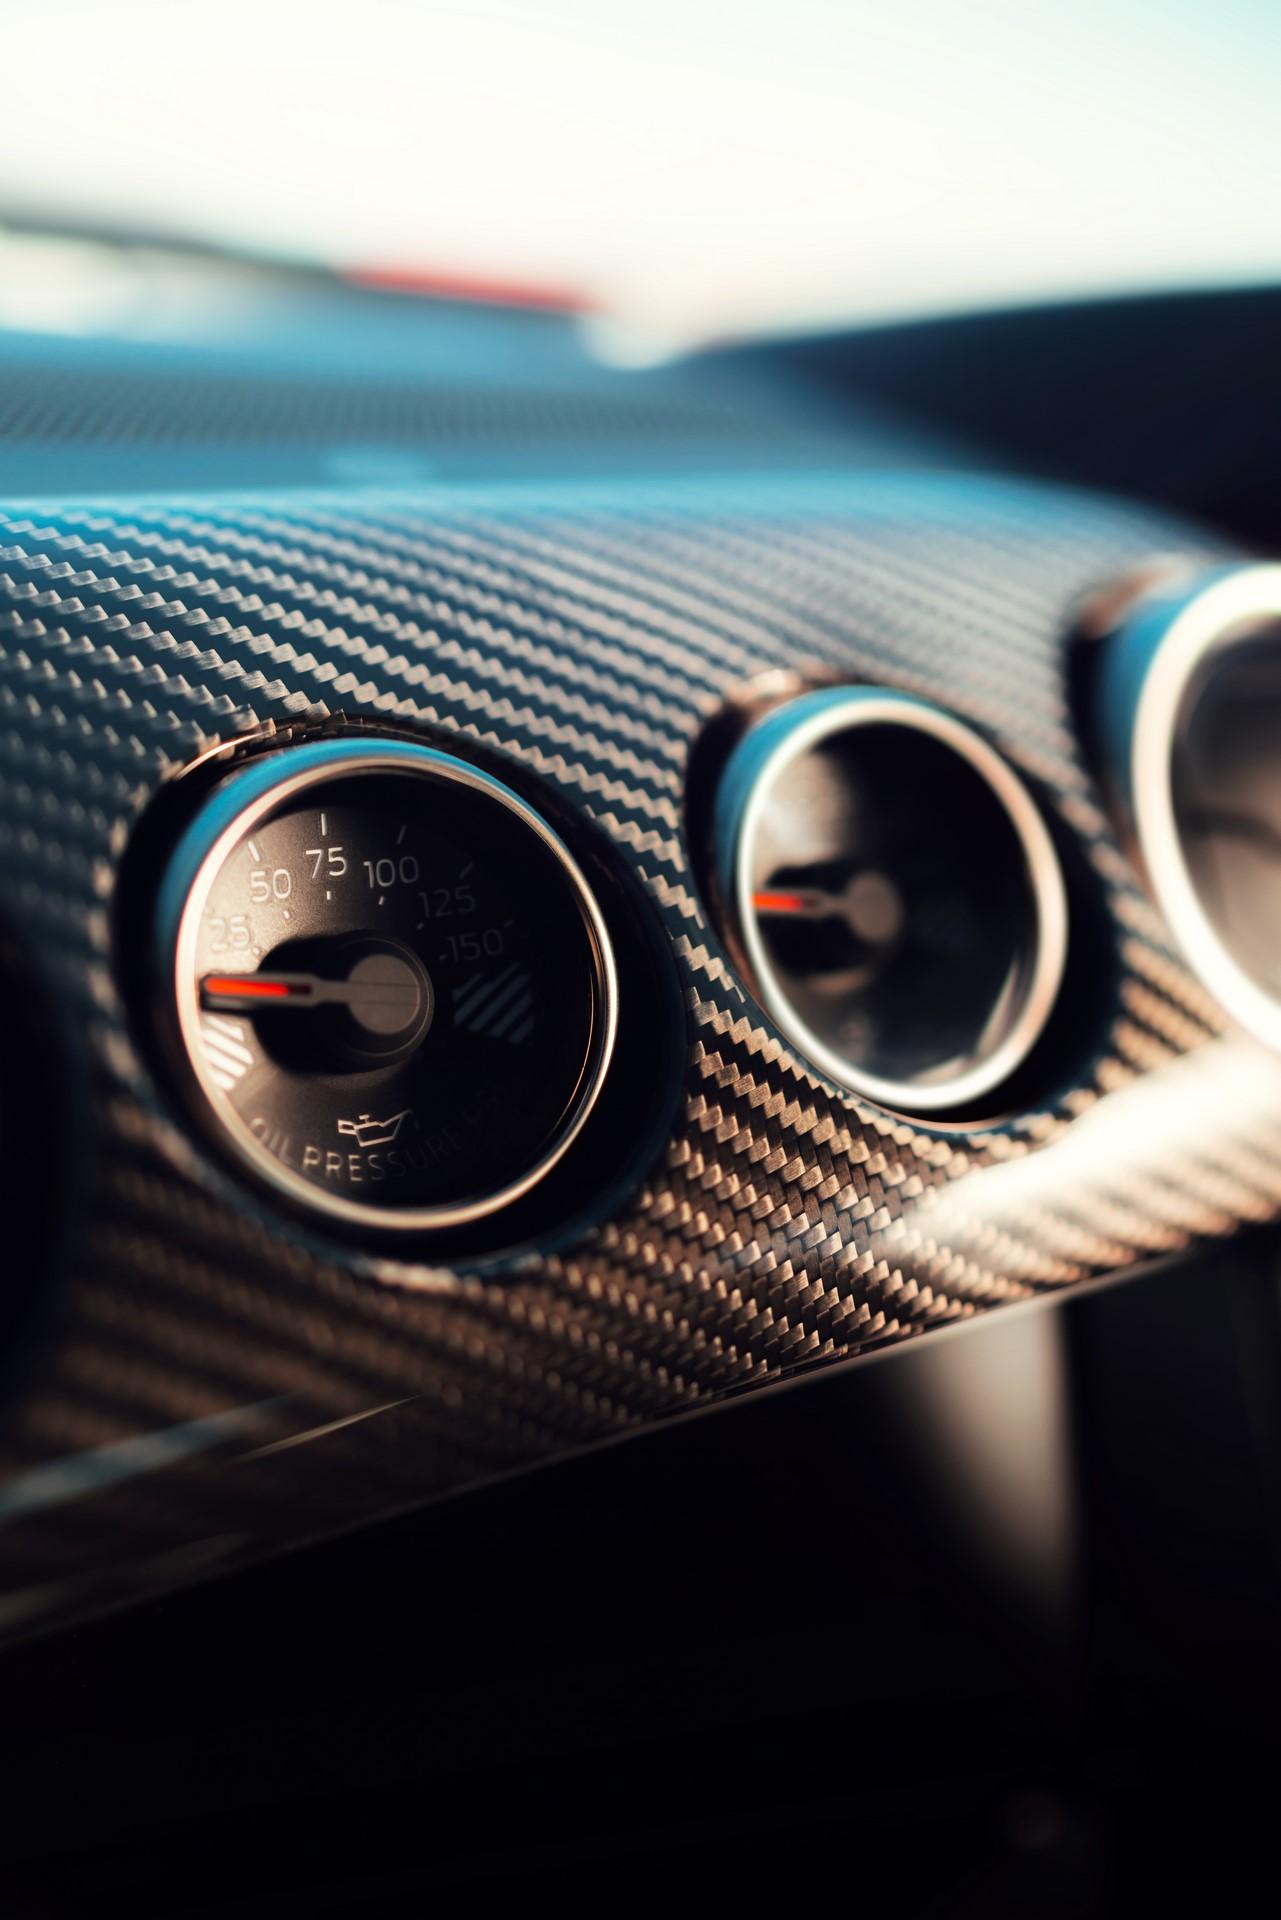 2020 Mustang Shelby GT500 interior